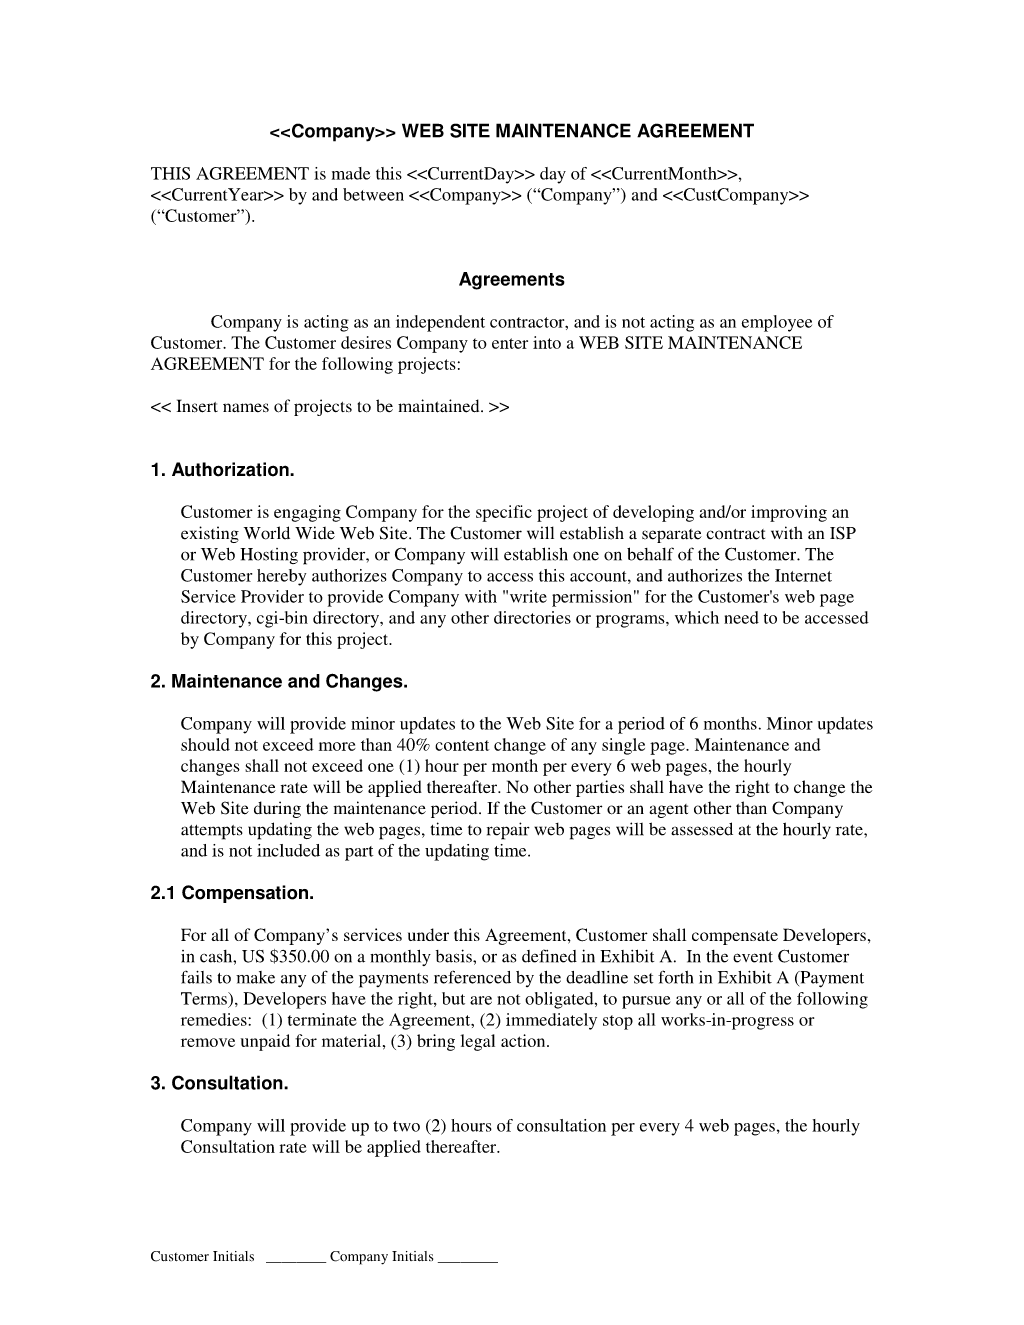 Web Site Maintenance Contract Web Development Contracts